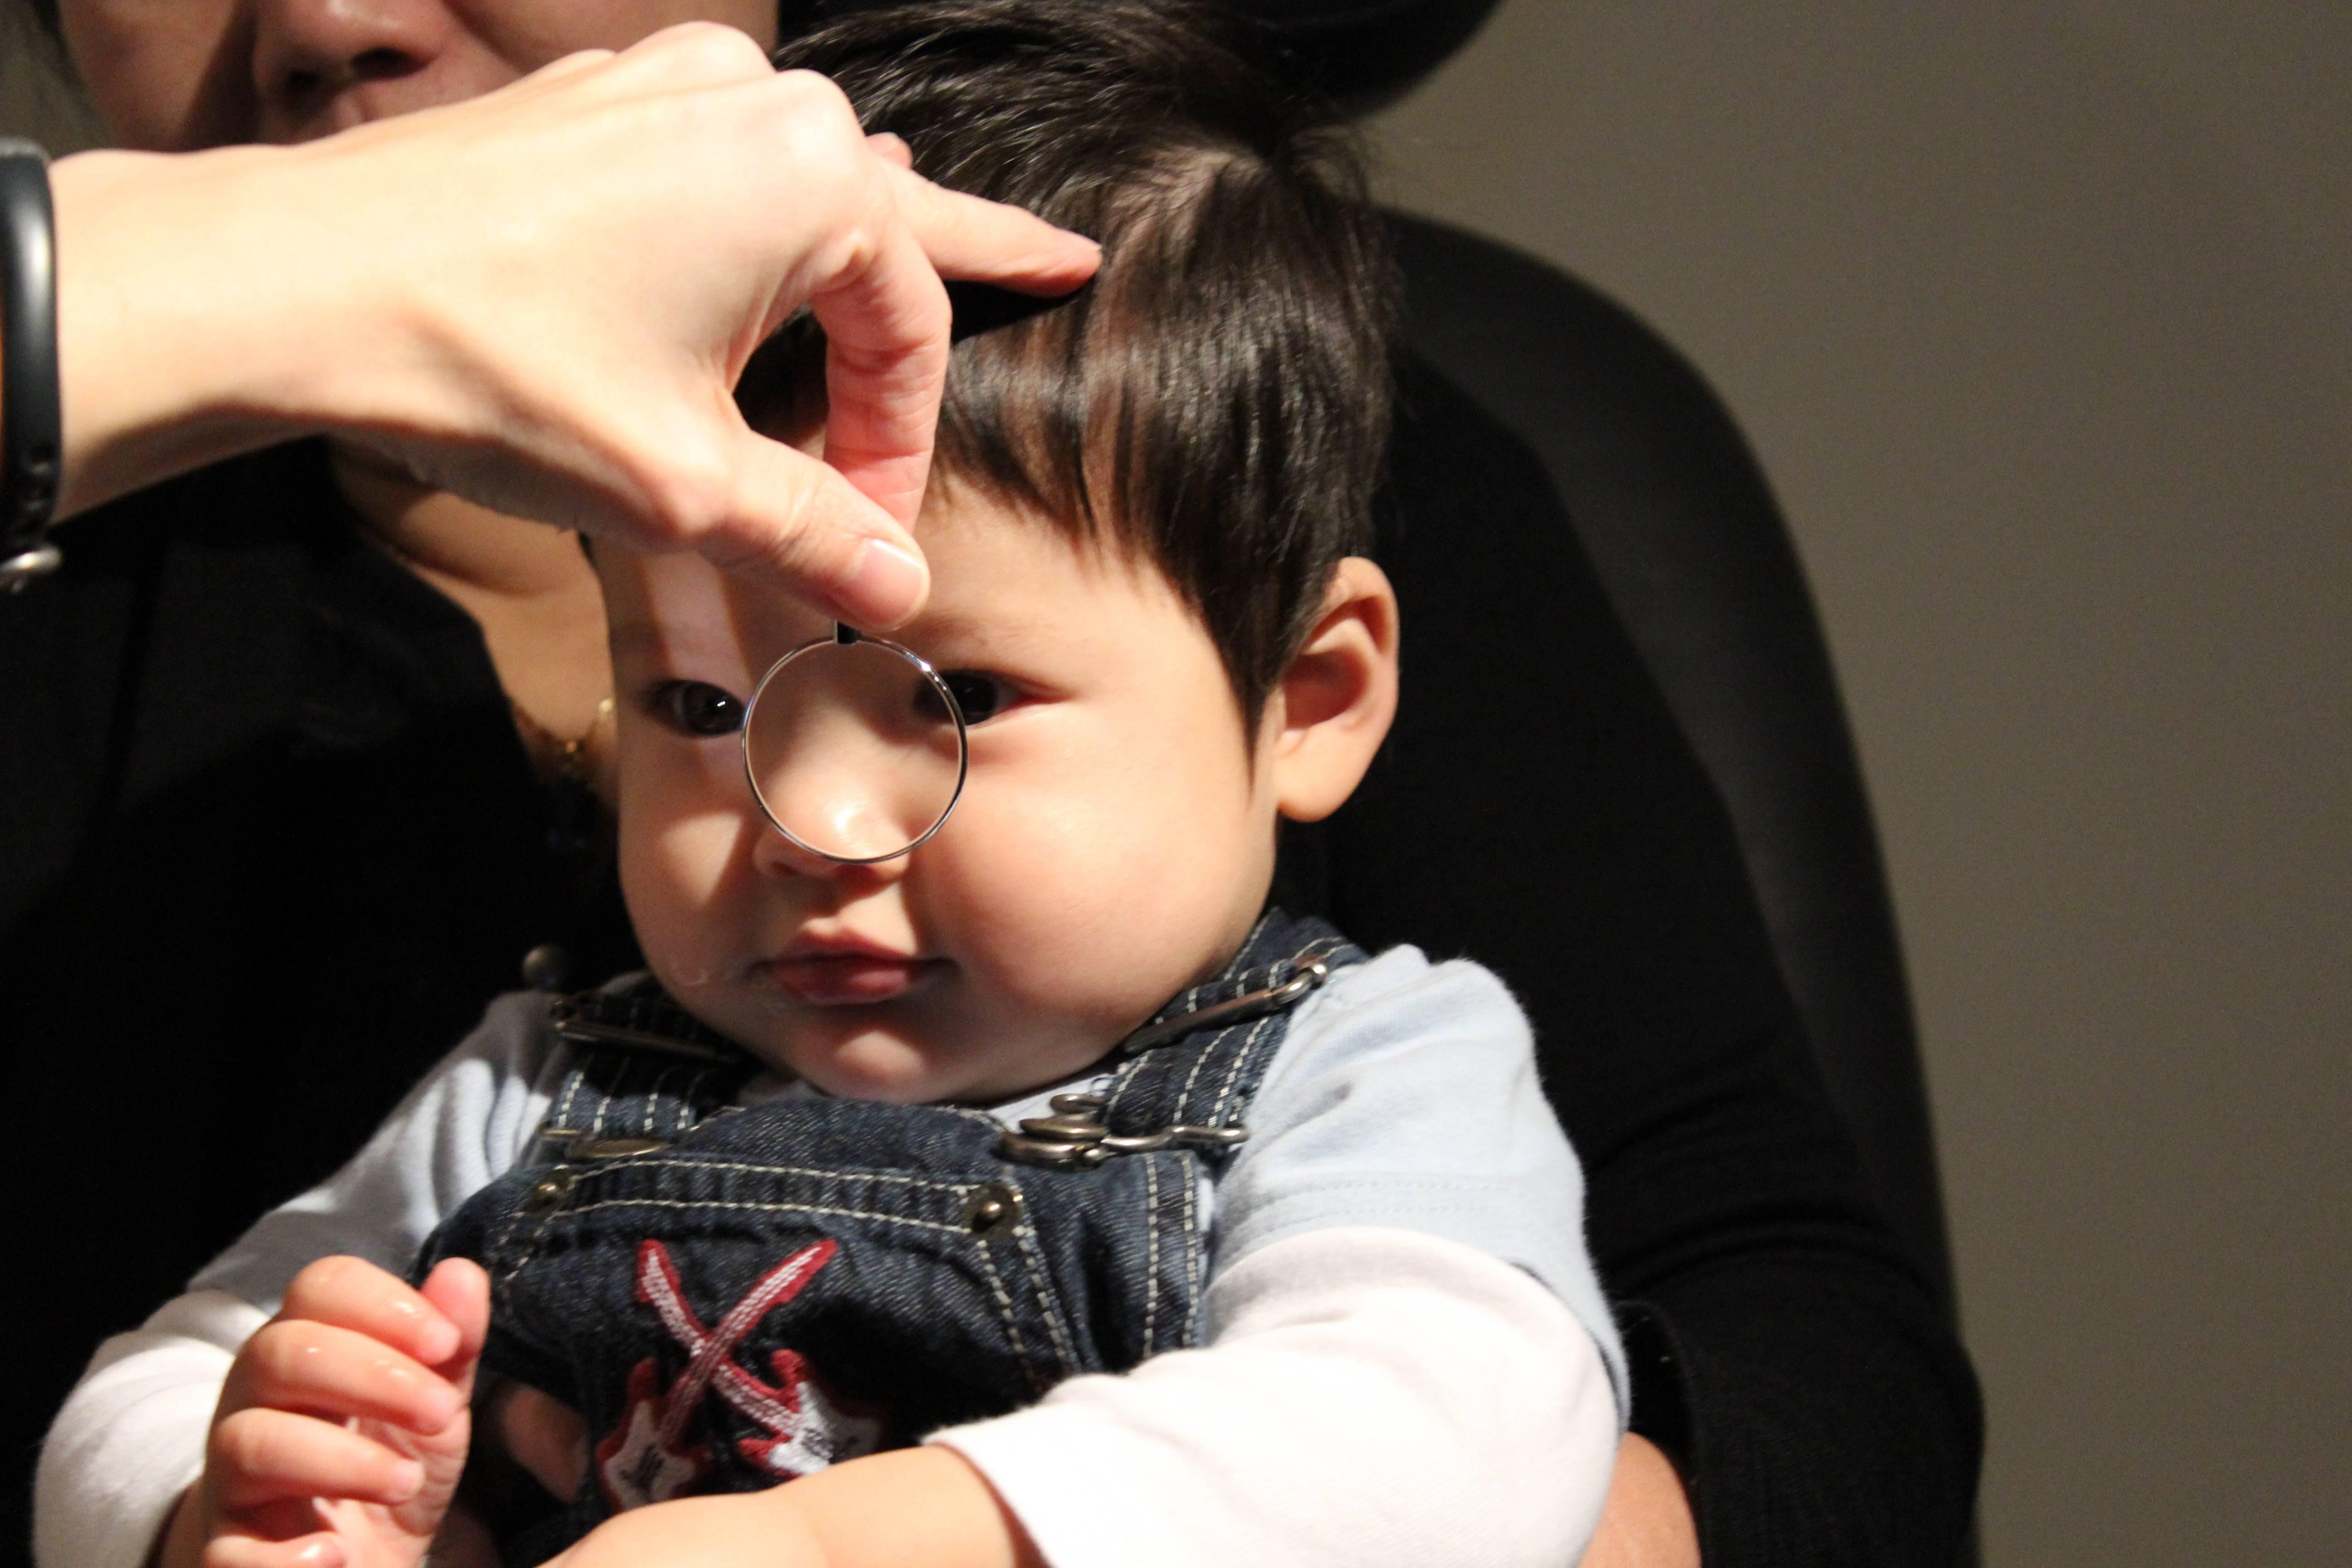 Infant See